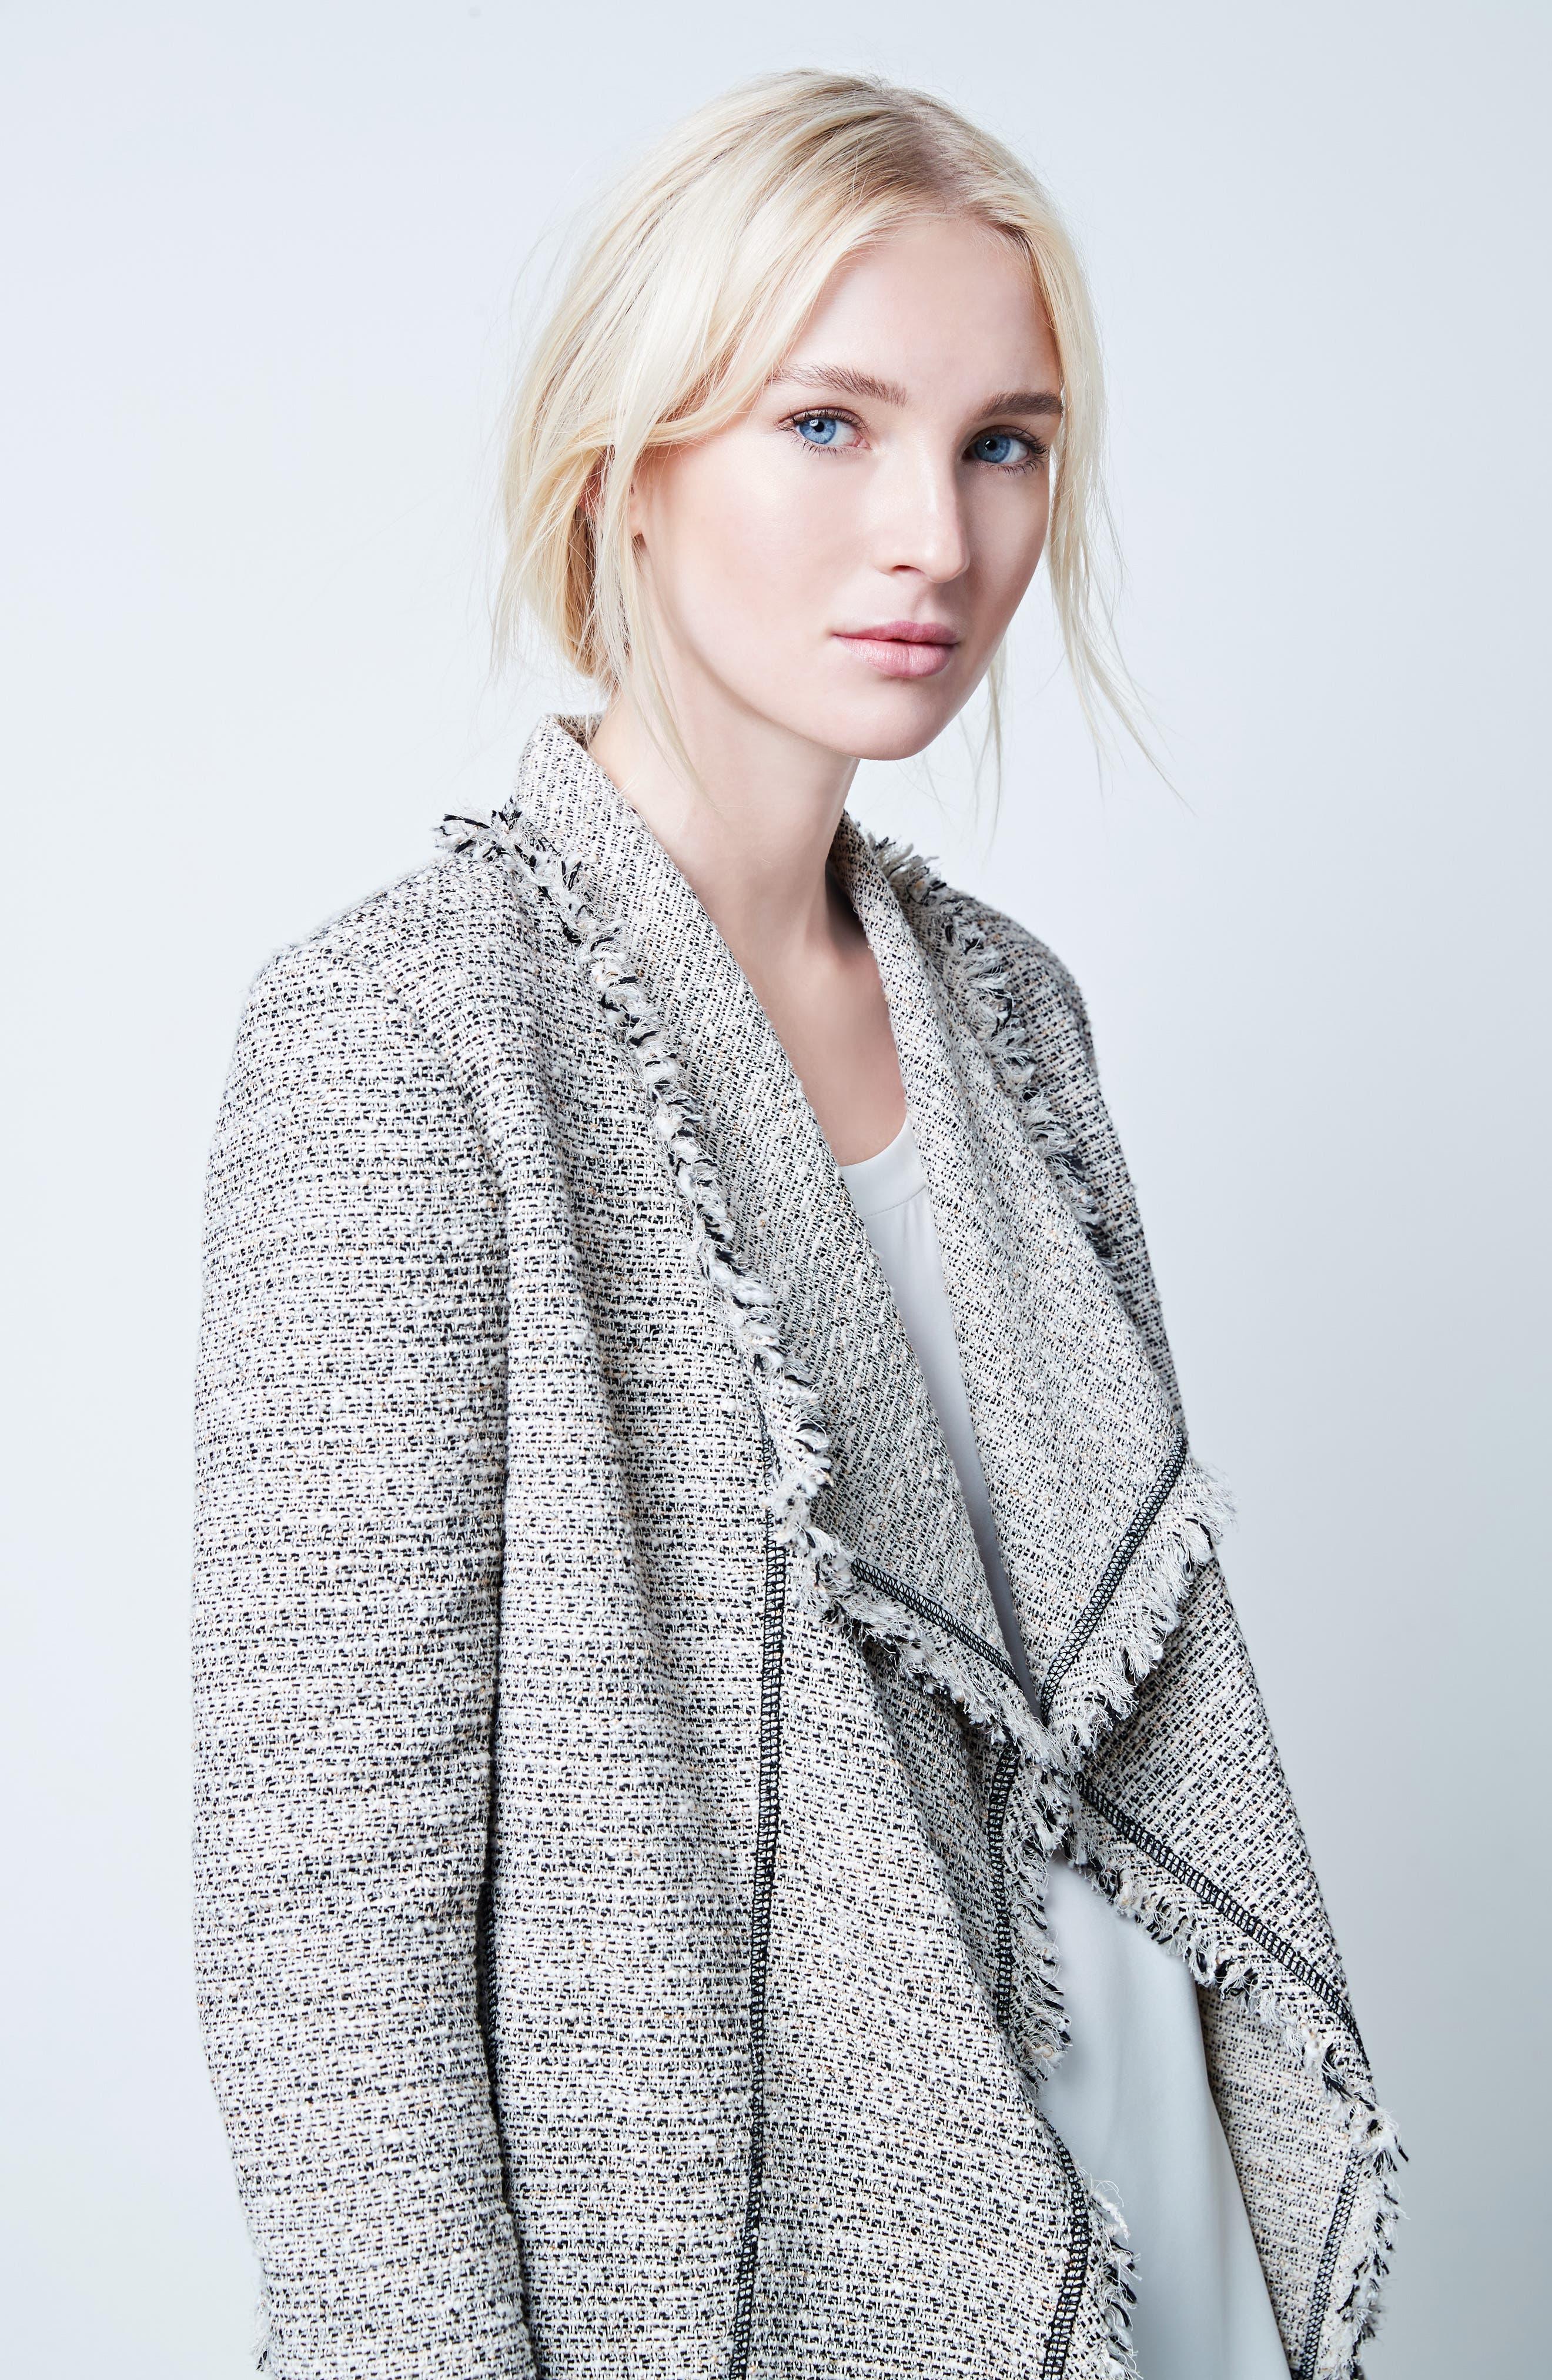 Eugena Drape Tweed Jacket,                             Alternate thumbnail 8, color,                             255